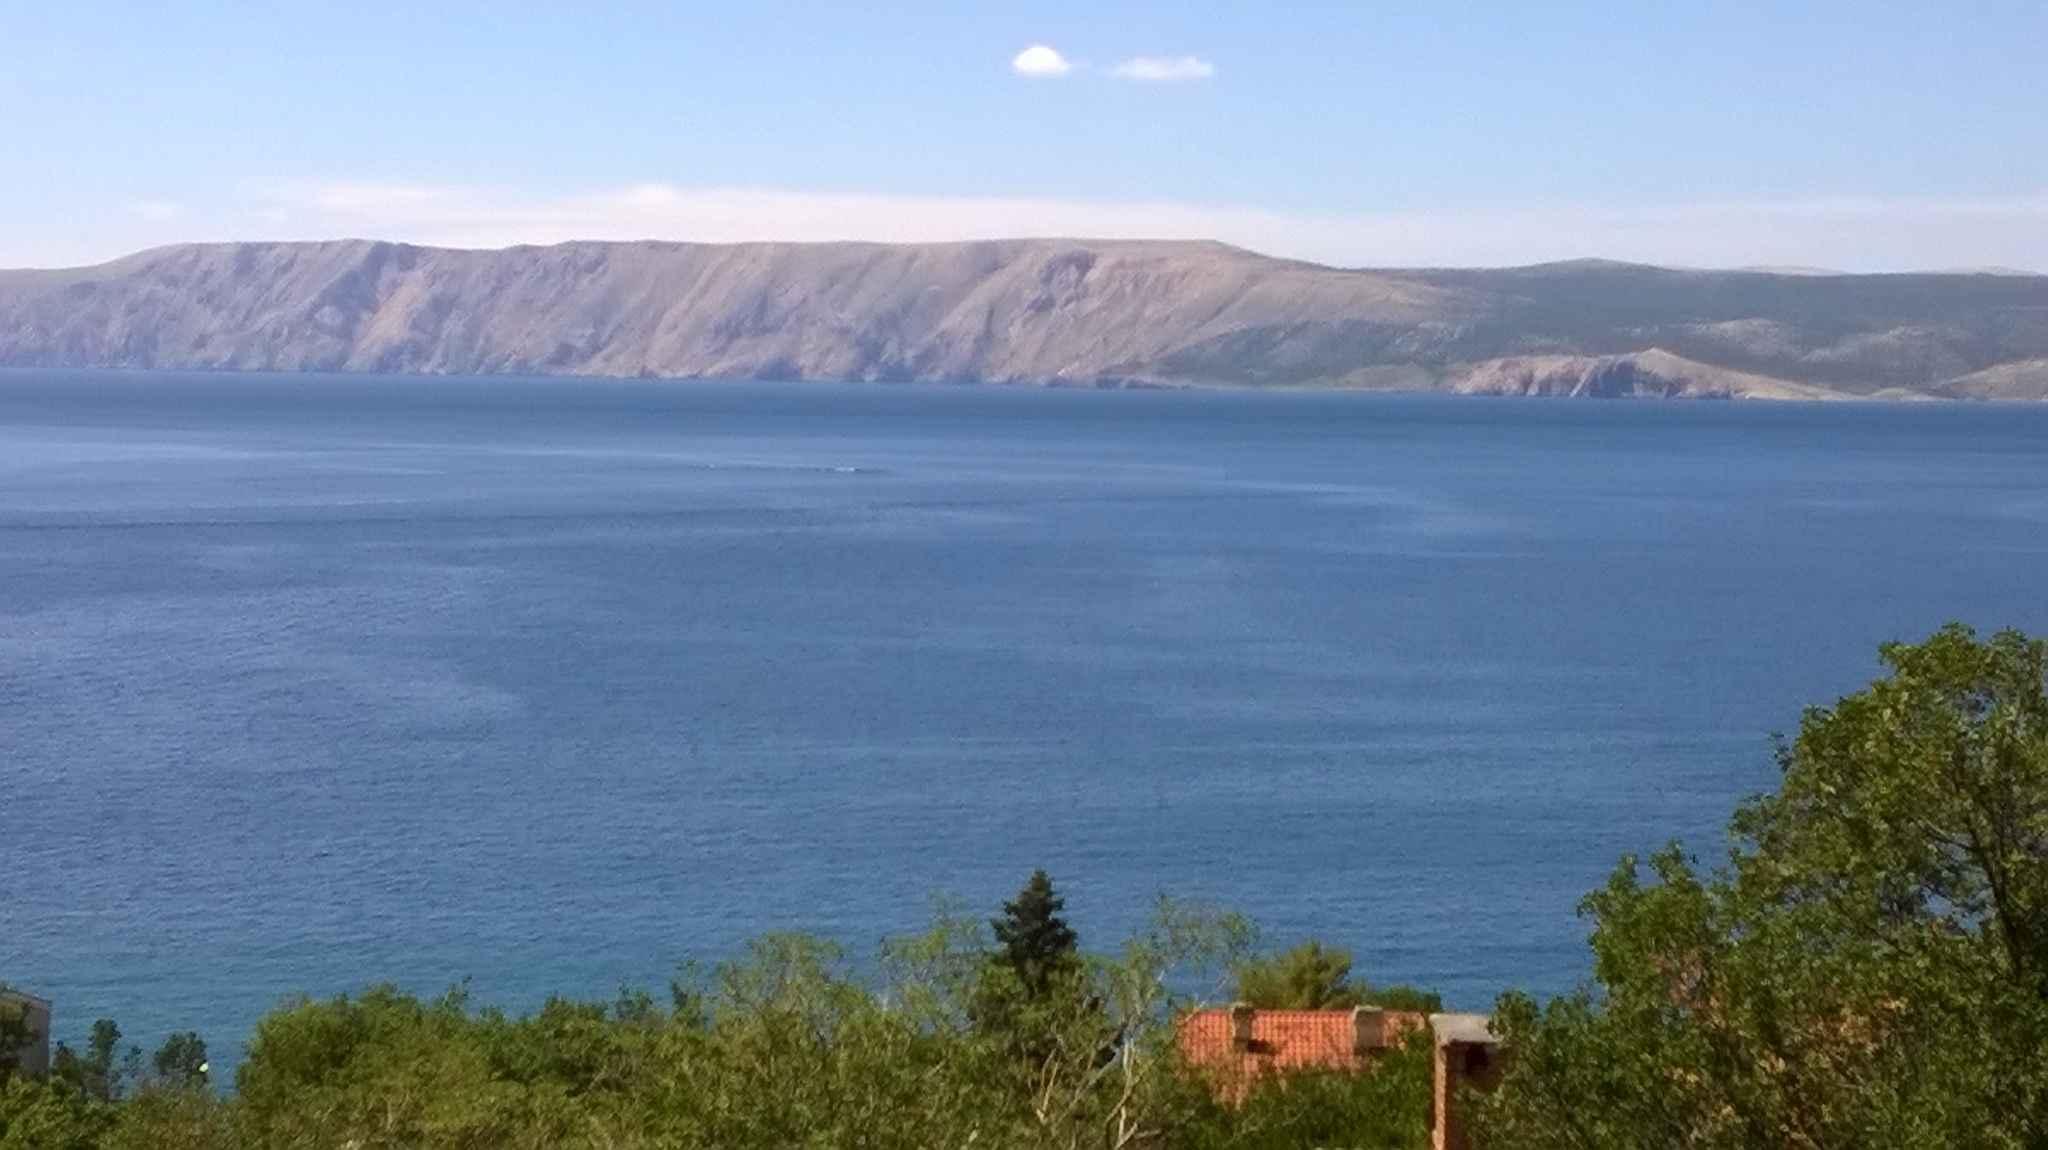 Appartement de vacances nahe von Meer, WI-FI, Klima (2182509), Novi Vinodolski, , Kvarner, Croatie, image 7